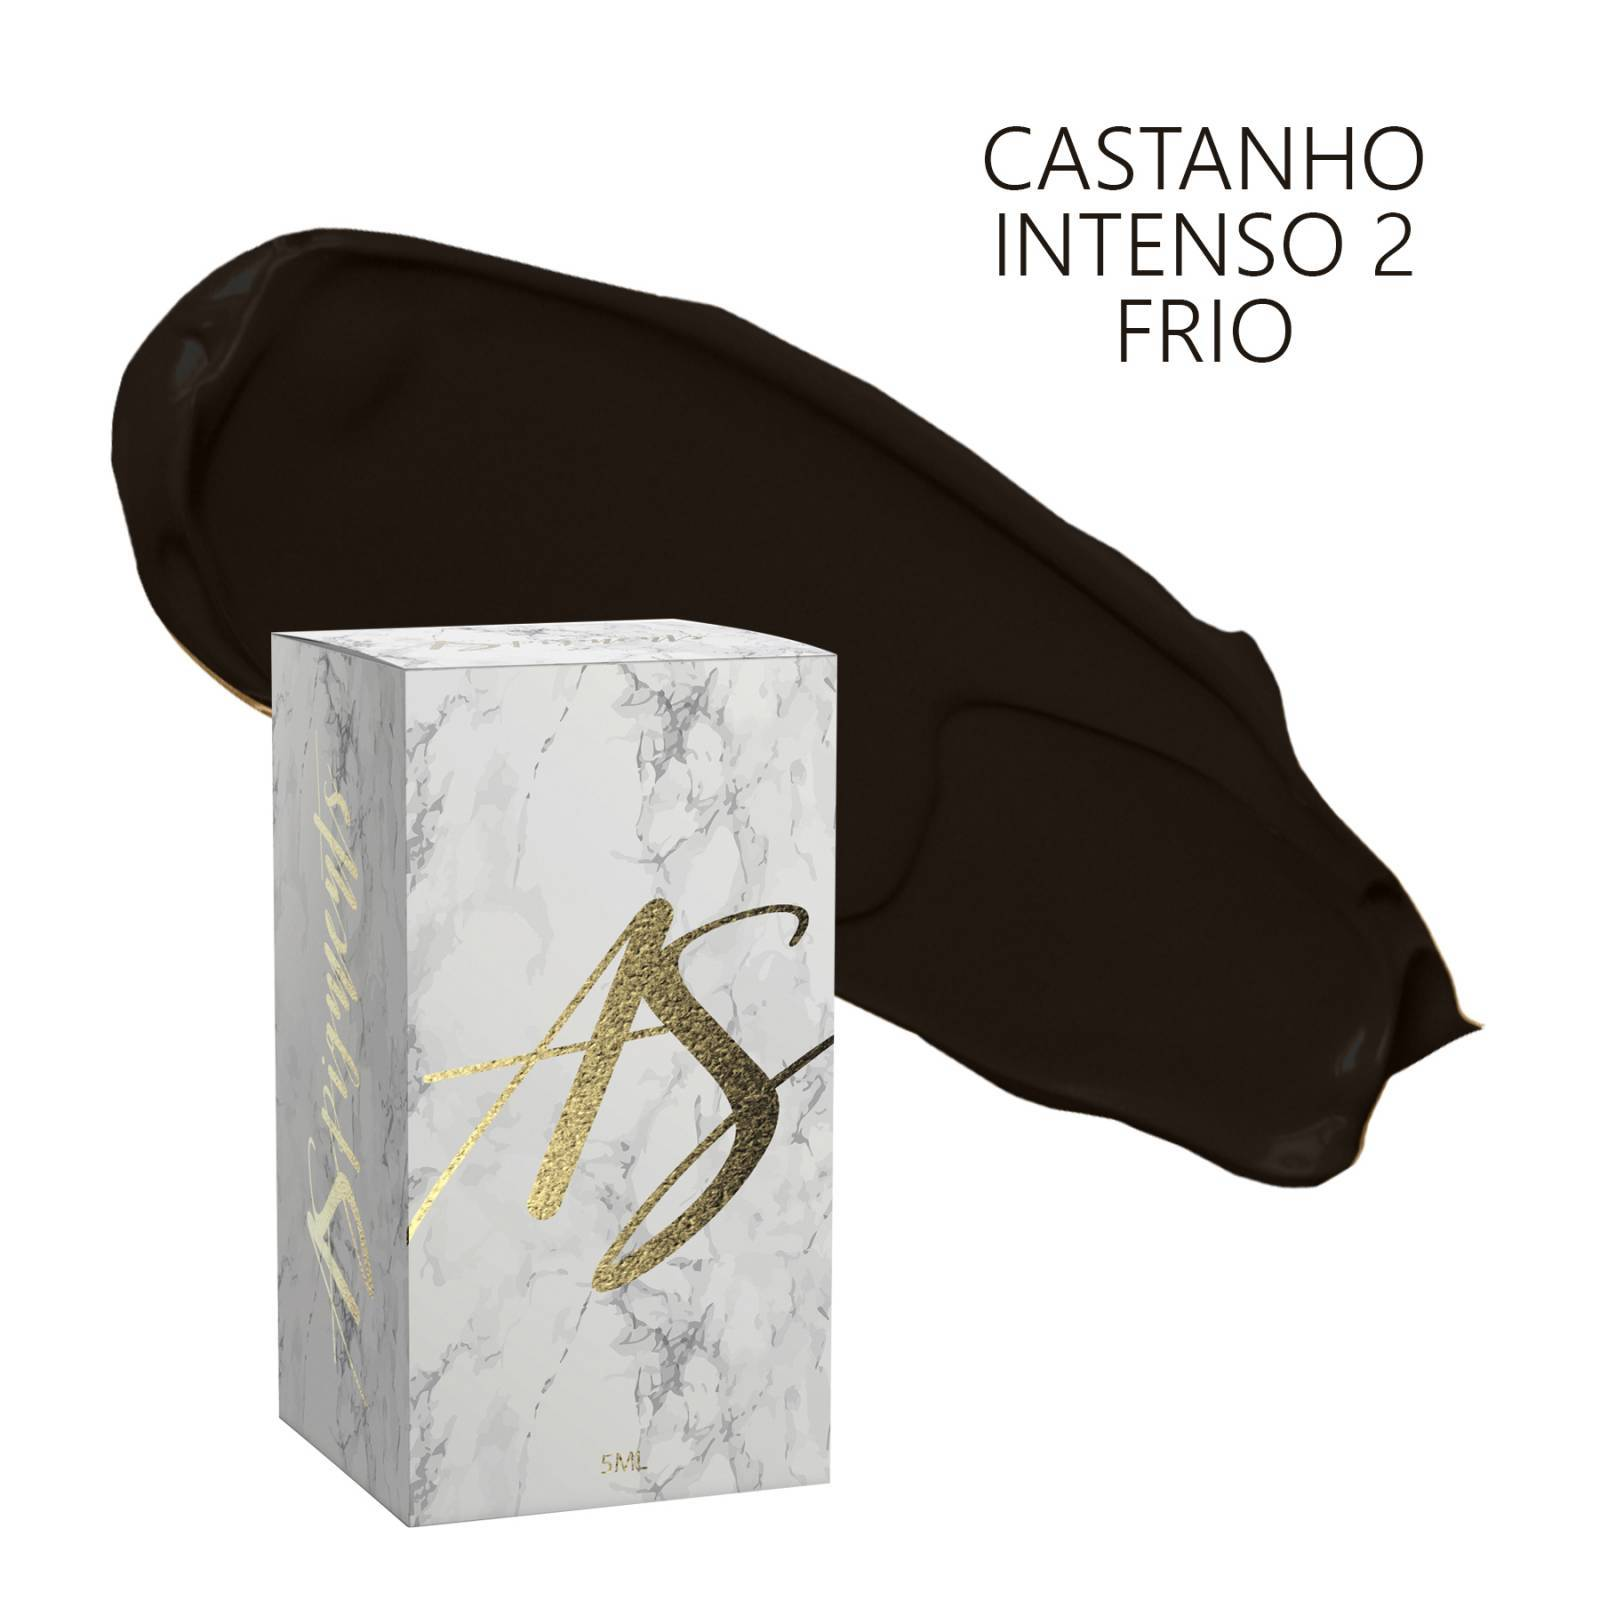 Pigmento Castanho intenso 2 frio- embalagem 5 ml - Loja Ana Paulla